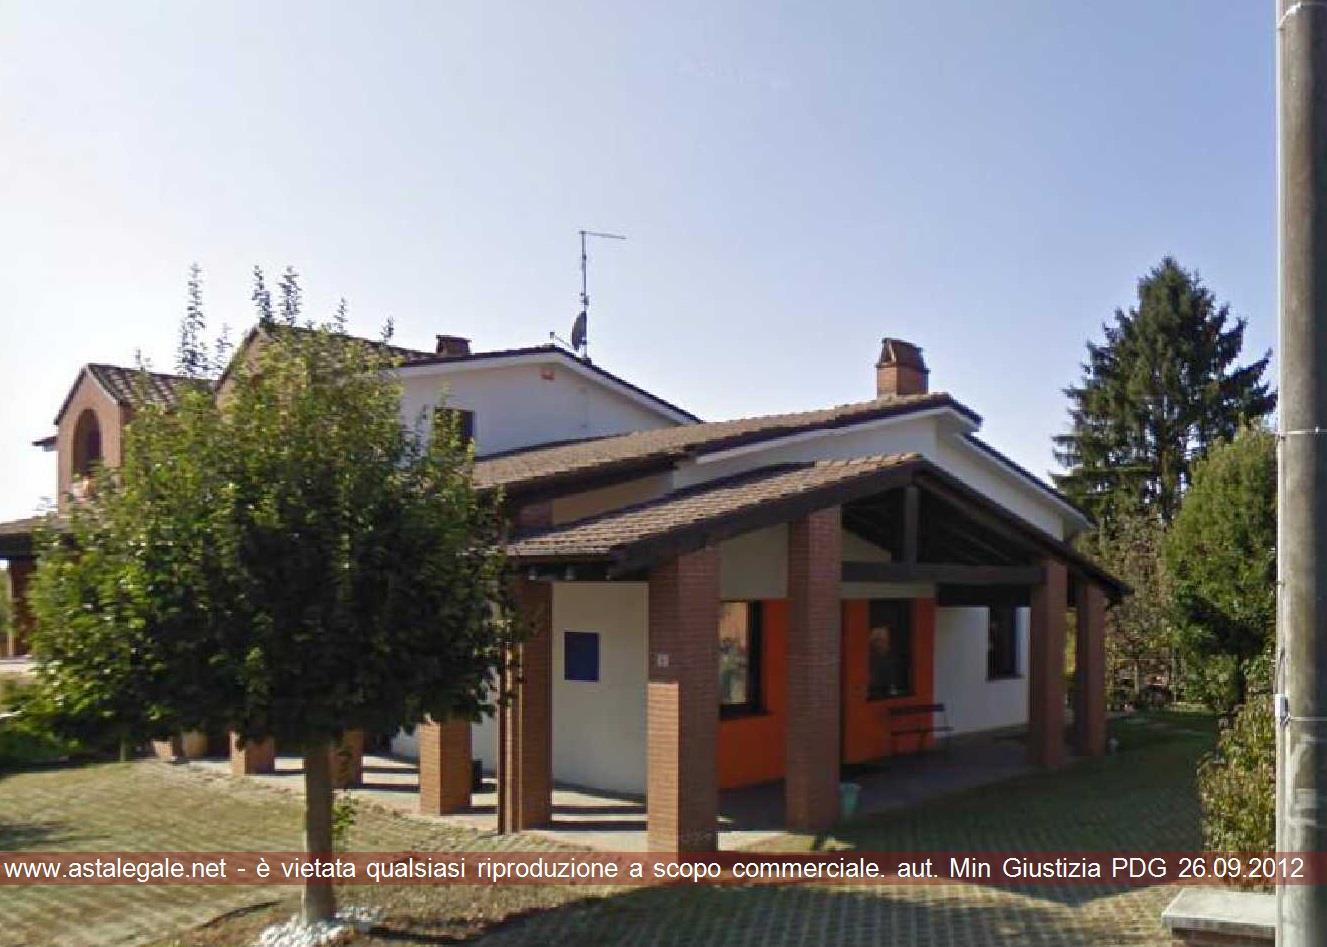 Villanova Sull'arda (PC) Via Roma  34/A